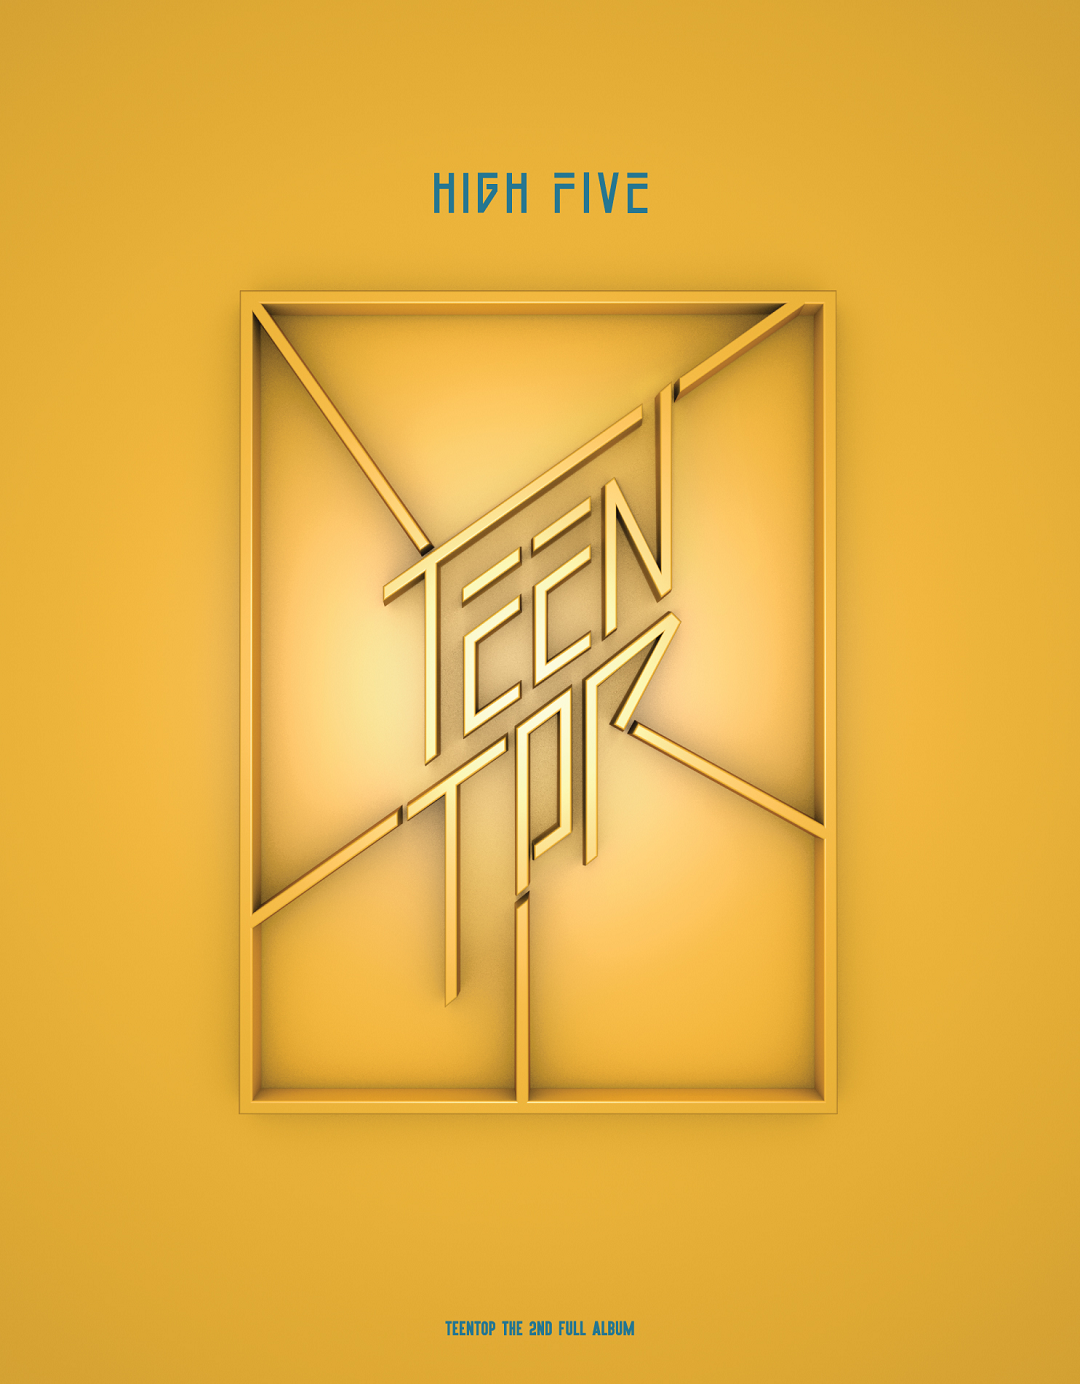 High Five (TEEN TOP)